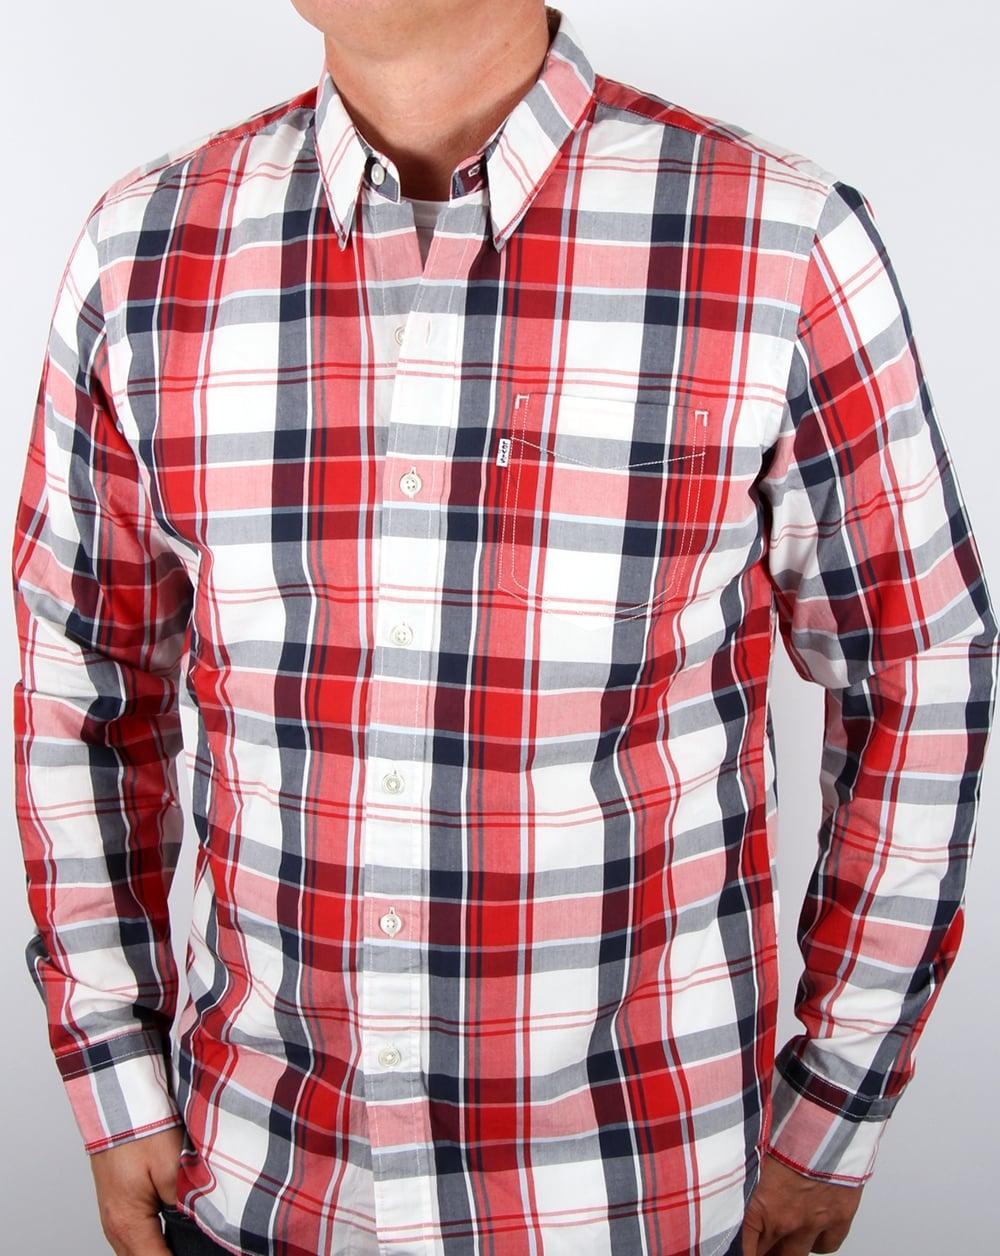 Levis Mens Sunset Check Long Sleeve Shirt Enam T One Pocket True Blue 65824 0337 Ceylon Dress Blues